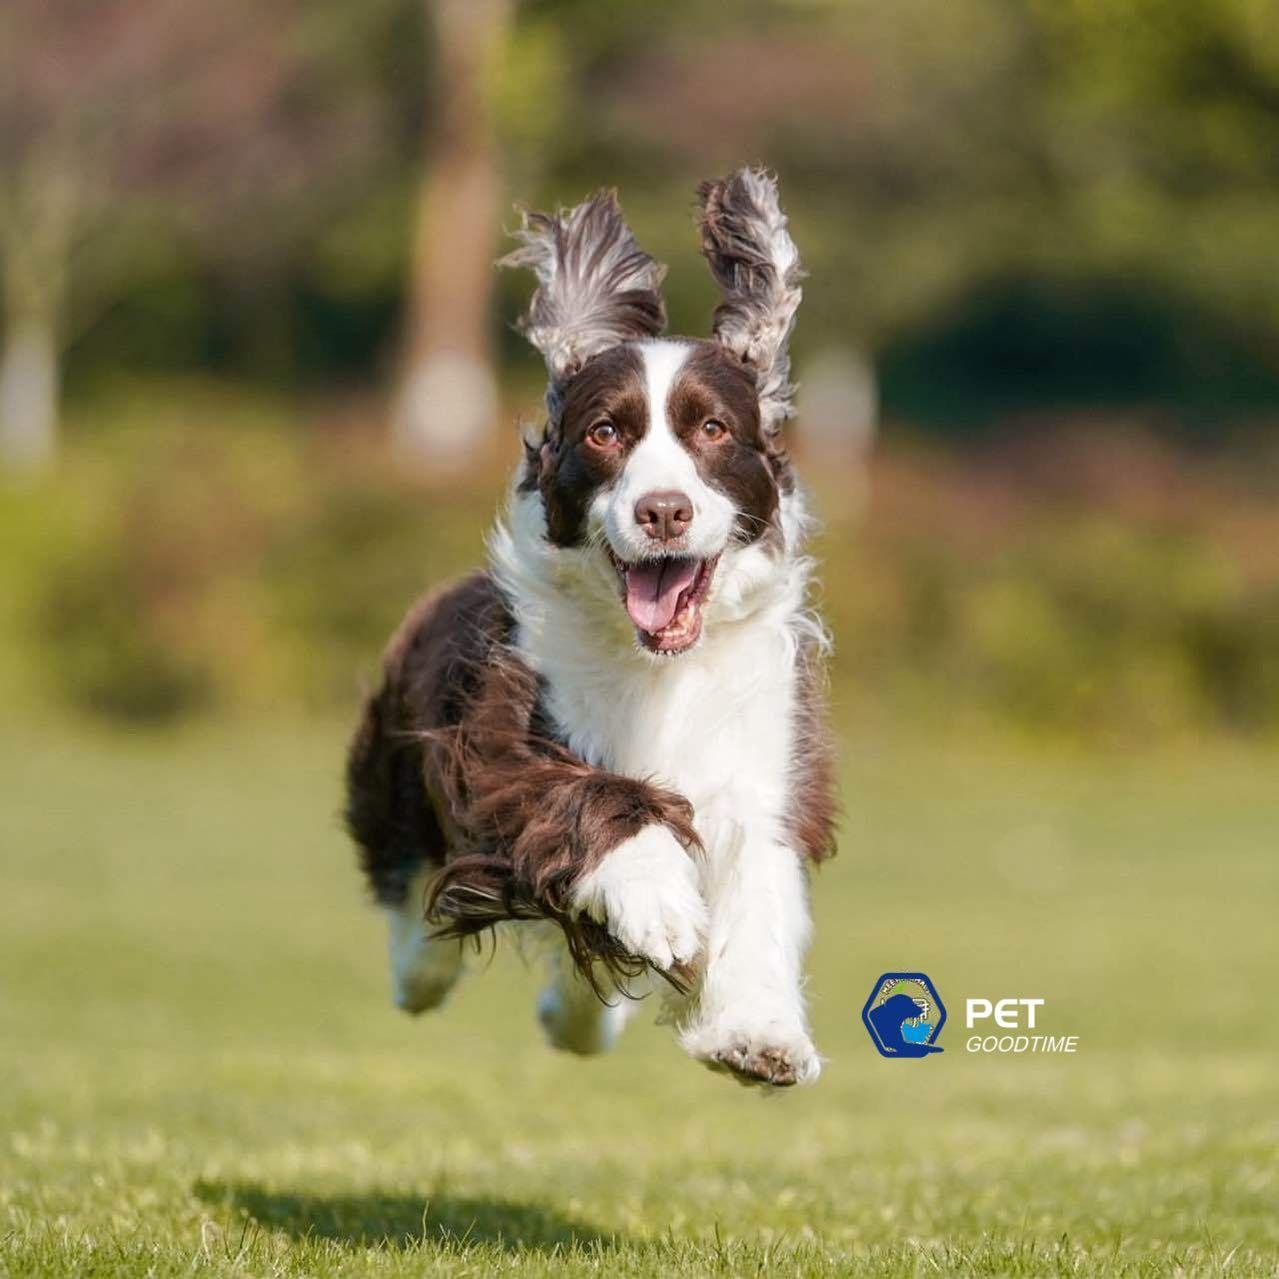 Running in the sunshine  #doglife #dogsofinstagram #dogstagram #dogphotography #dogofinstagram #dogstyle #dog #petsofinstagram #petphotography #dogwalking #petlovers